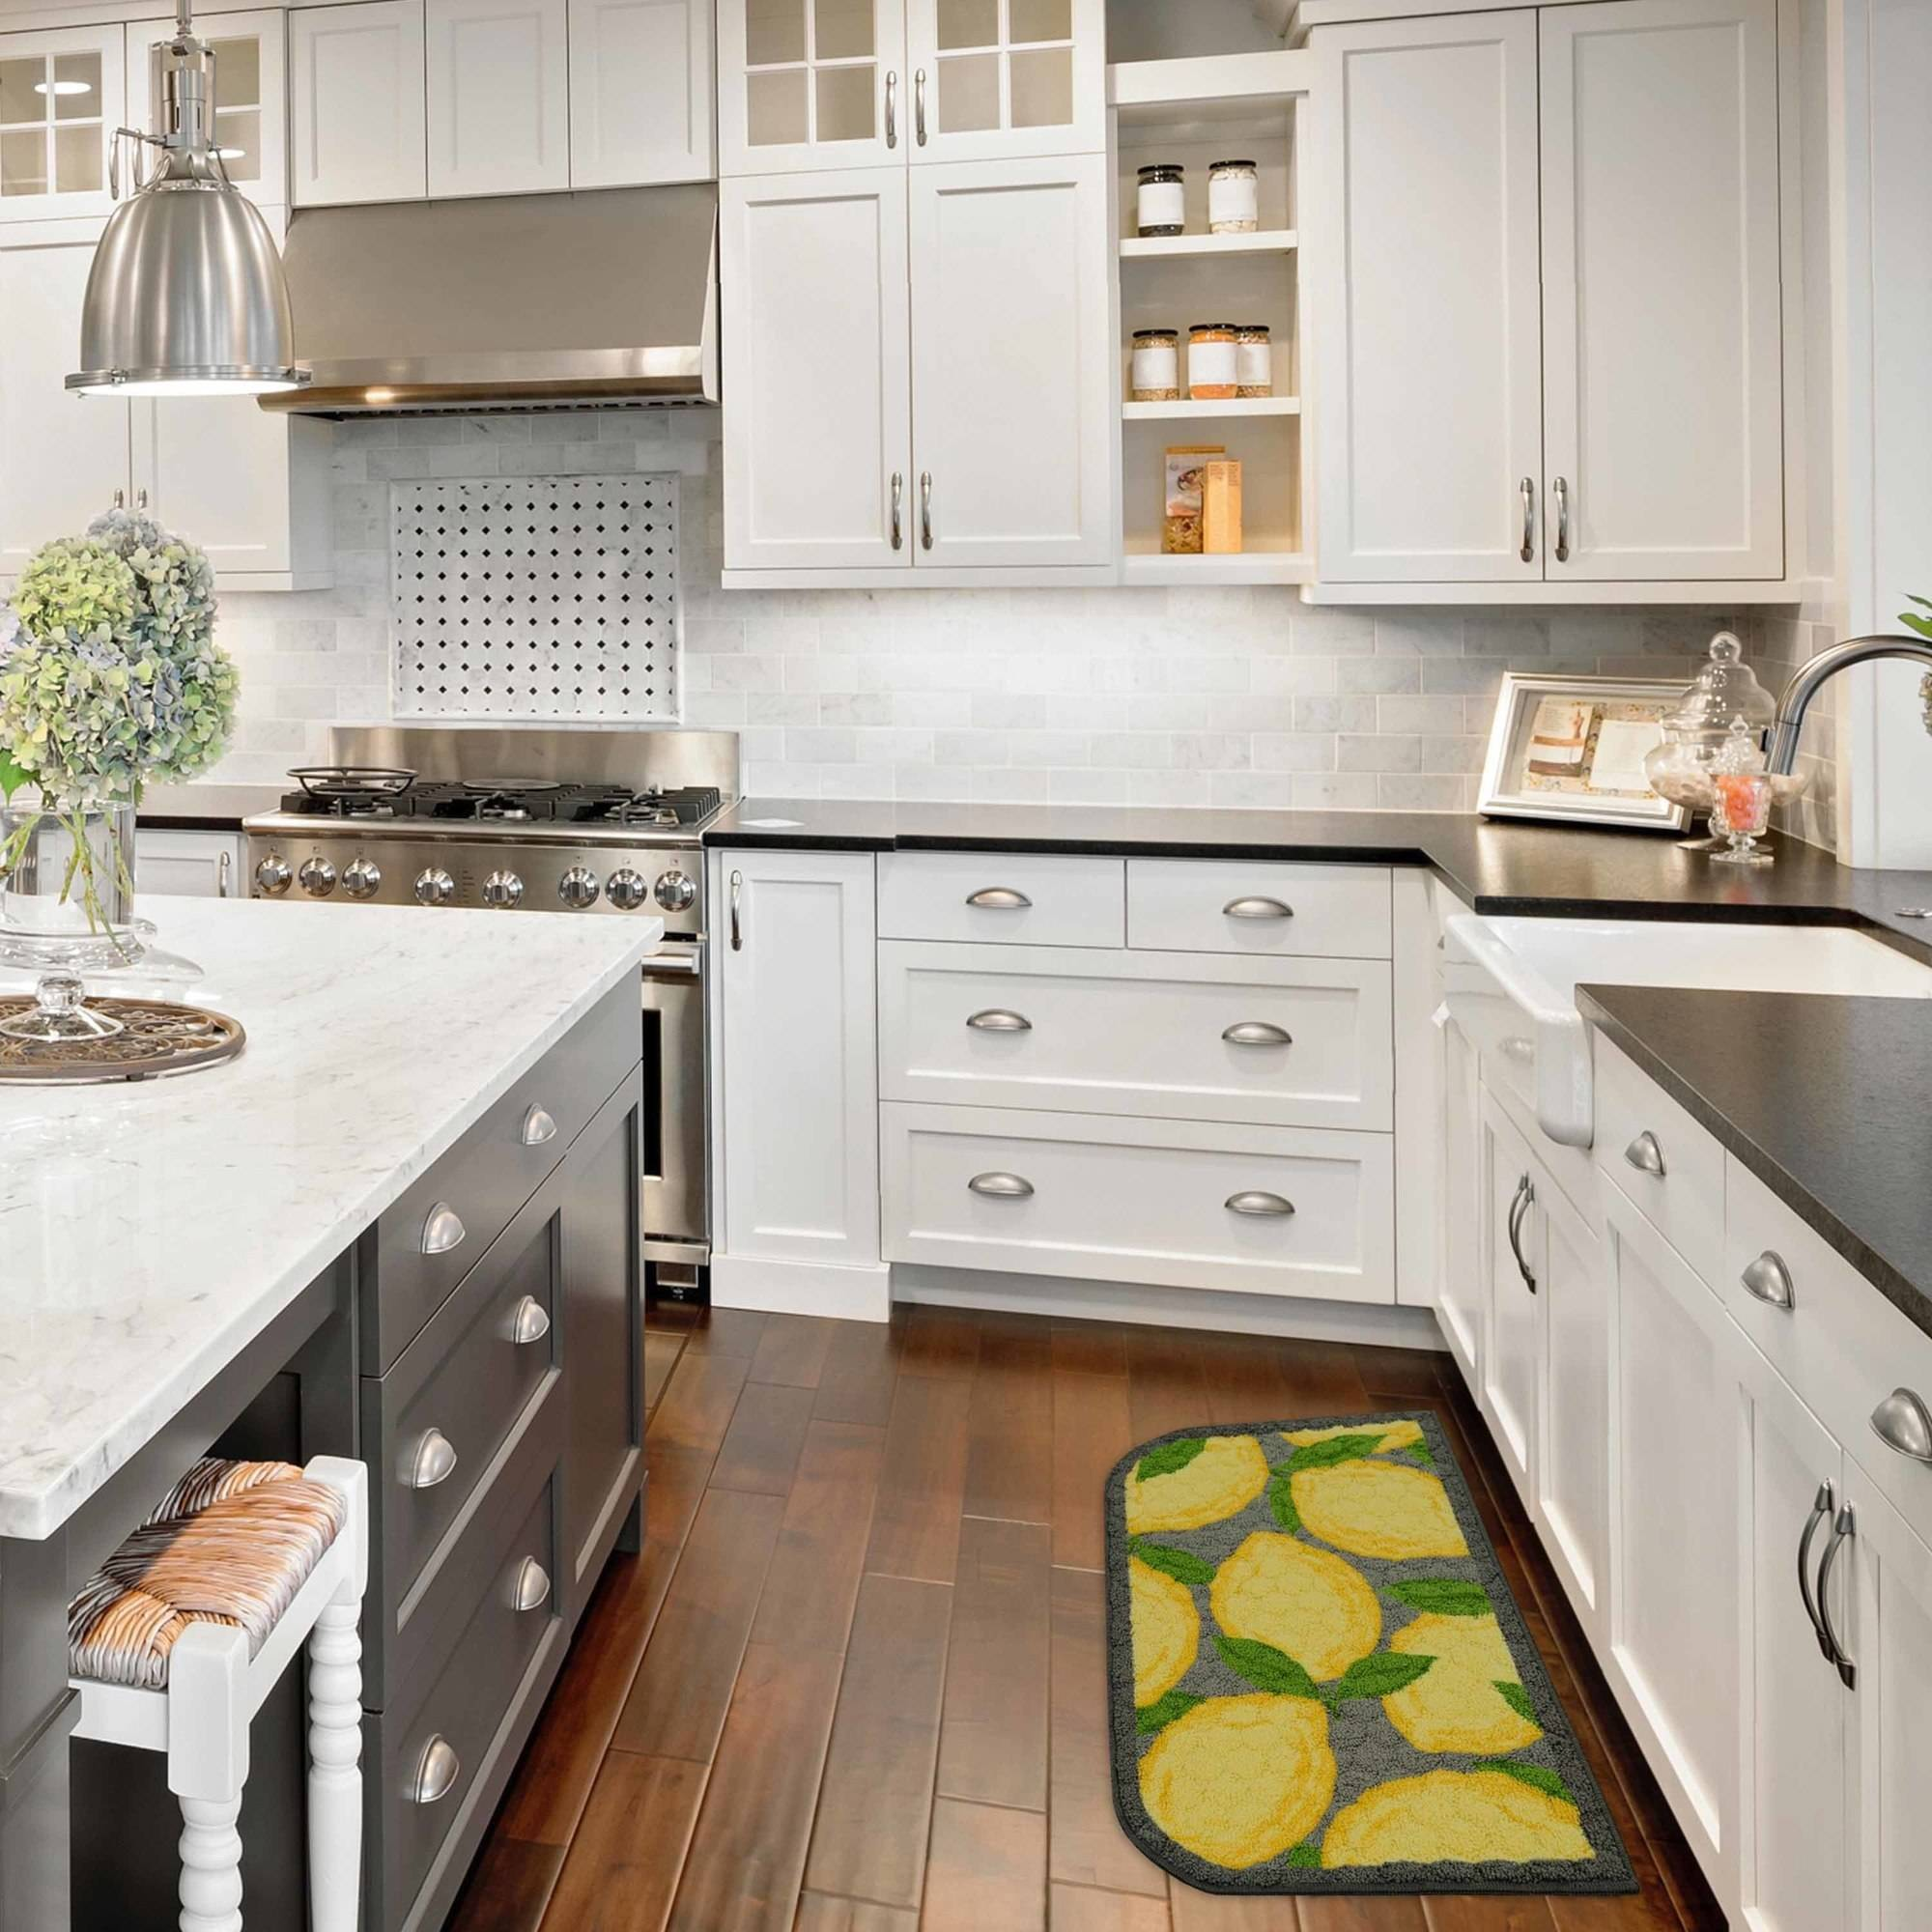 Great Better Homes And Gardens Lemon Kitchen Rug   Walmart.com